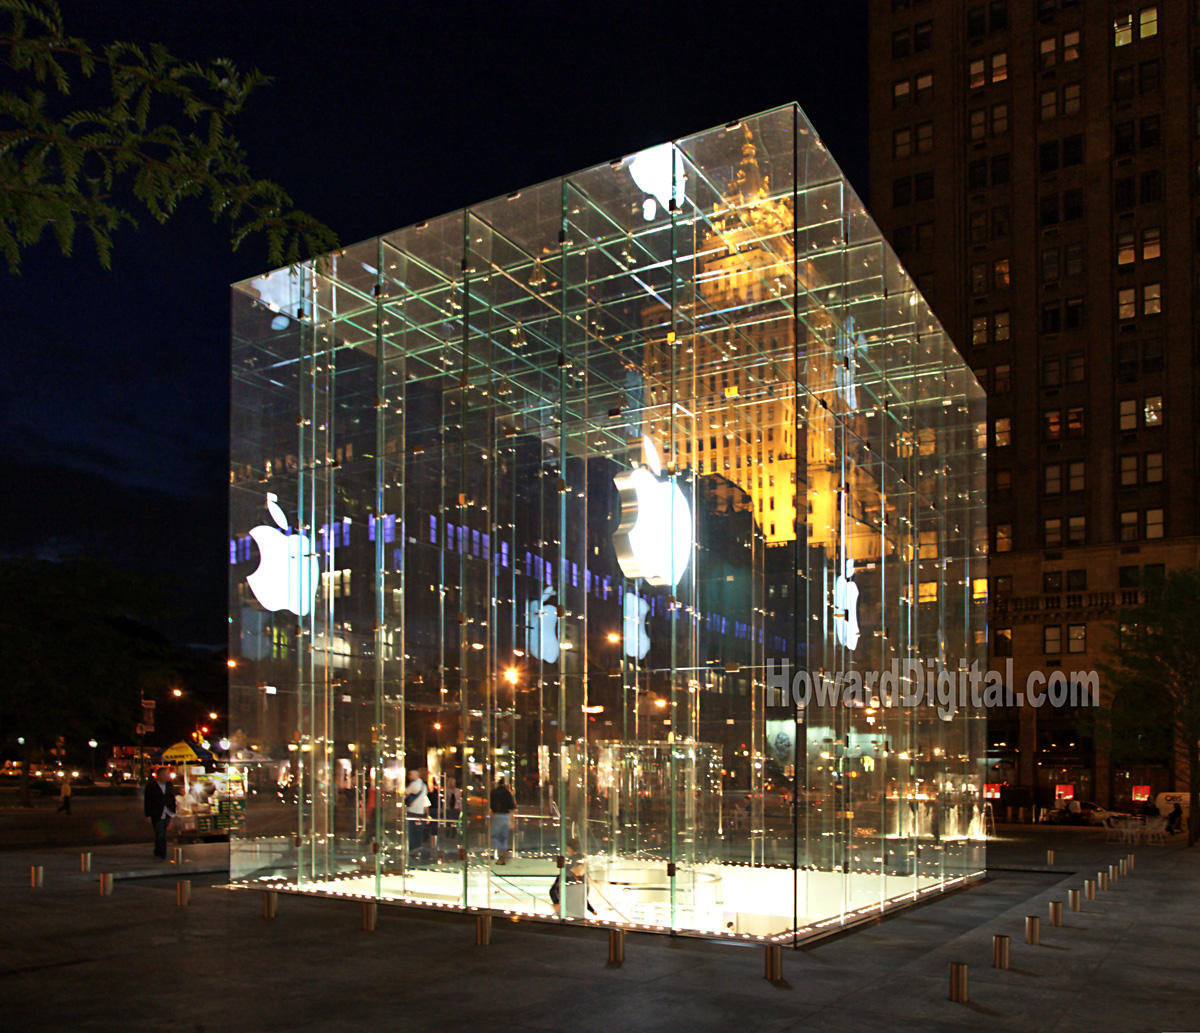 75109d1315373167 apple store apple store imagejpg 1200x1033